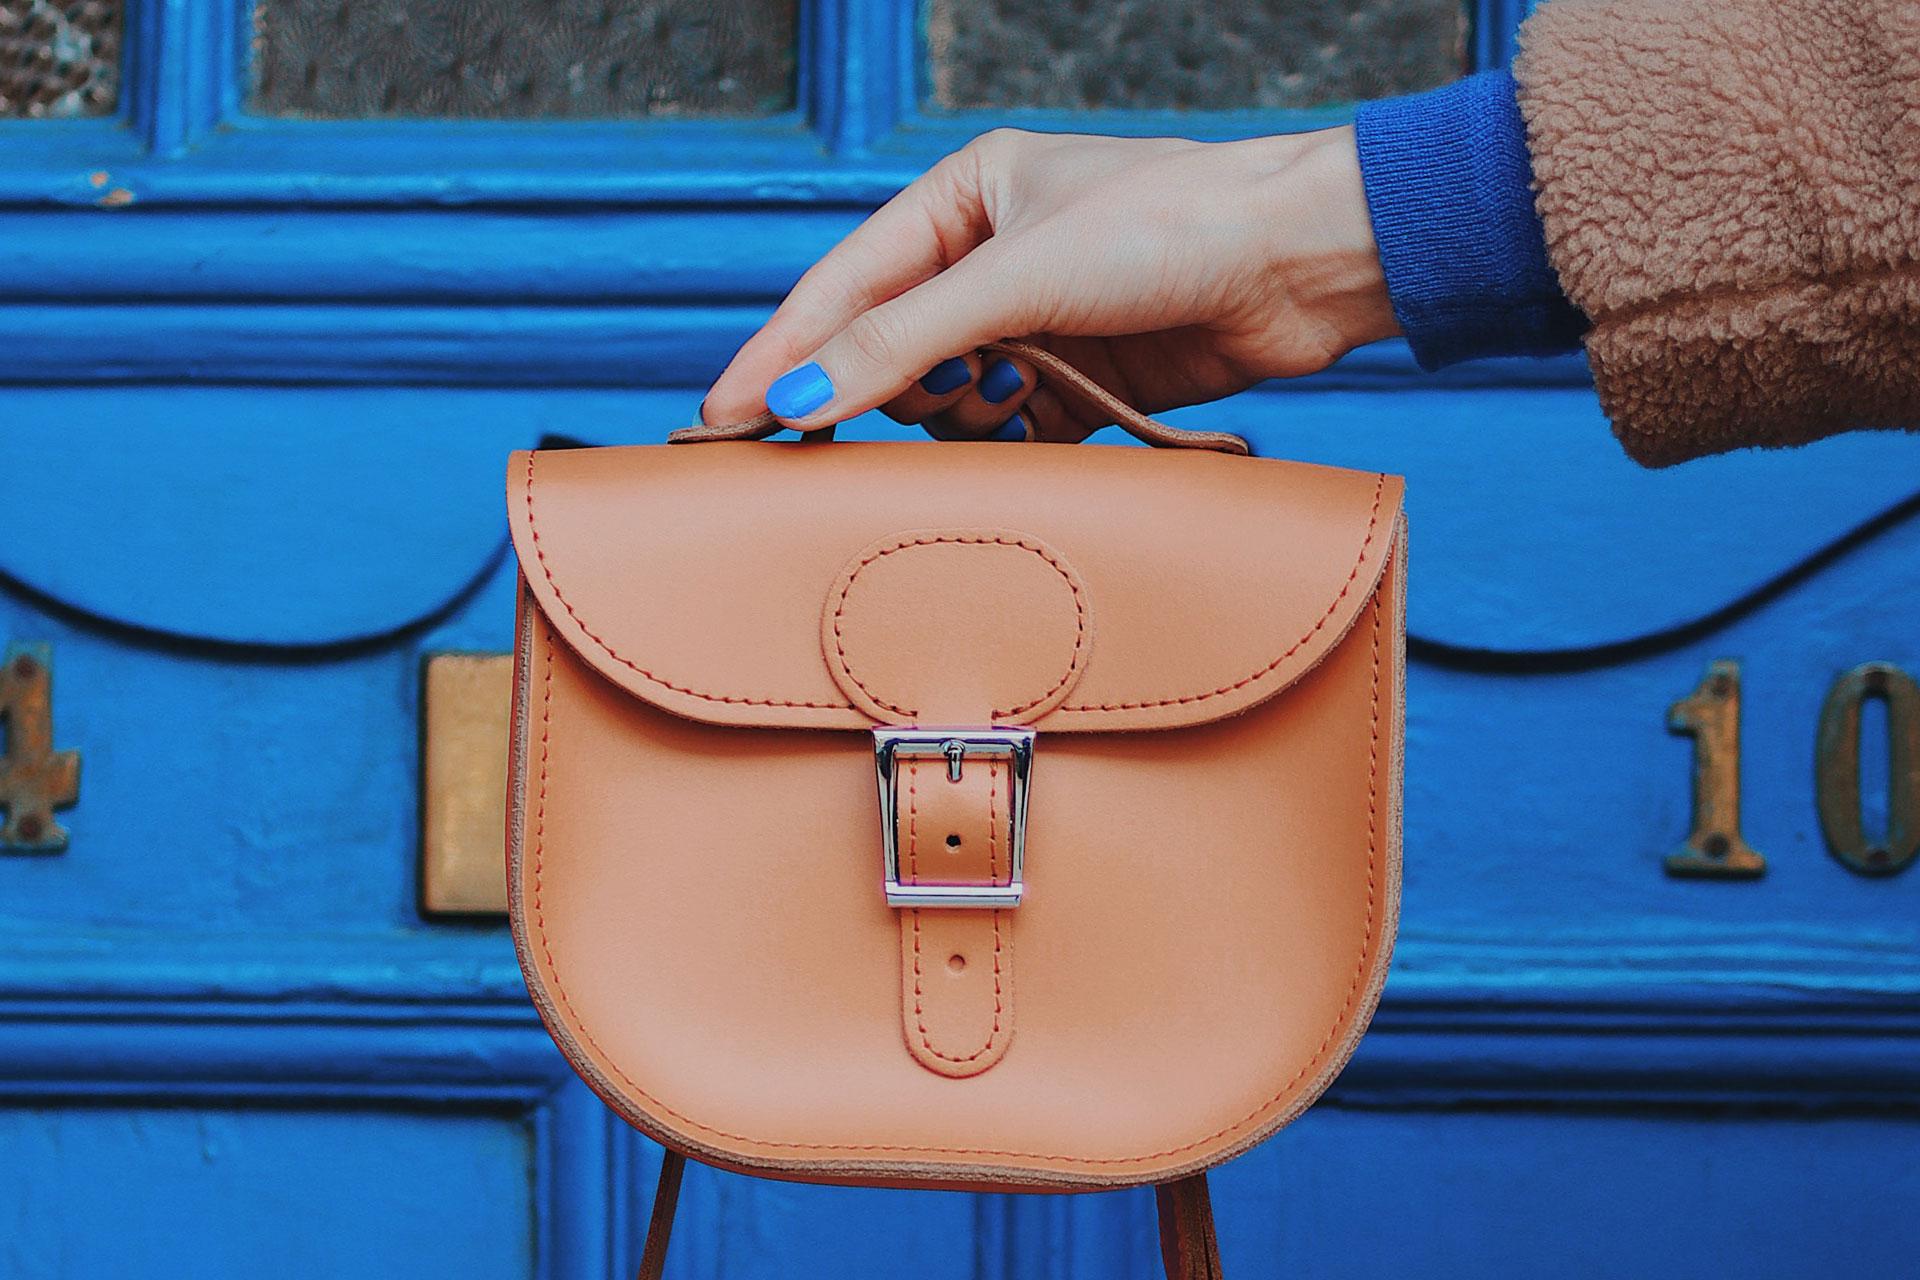 HALF PINT SMALL SATCHEL BAG £75.00, £82.50 Personalised FREE BAG CHARM!